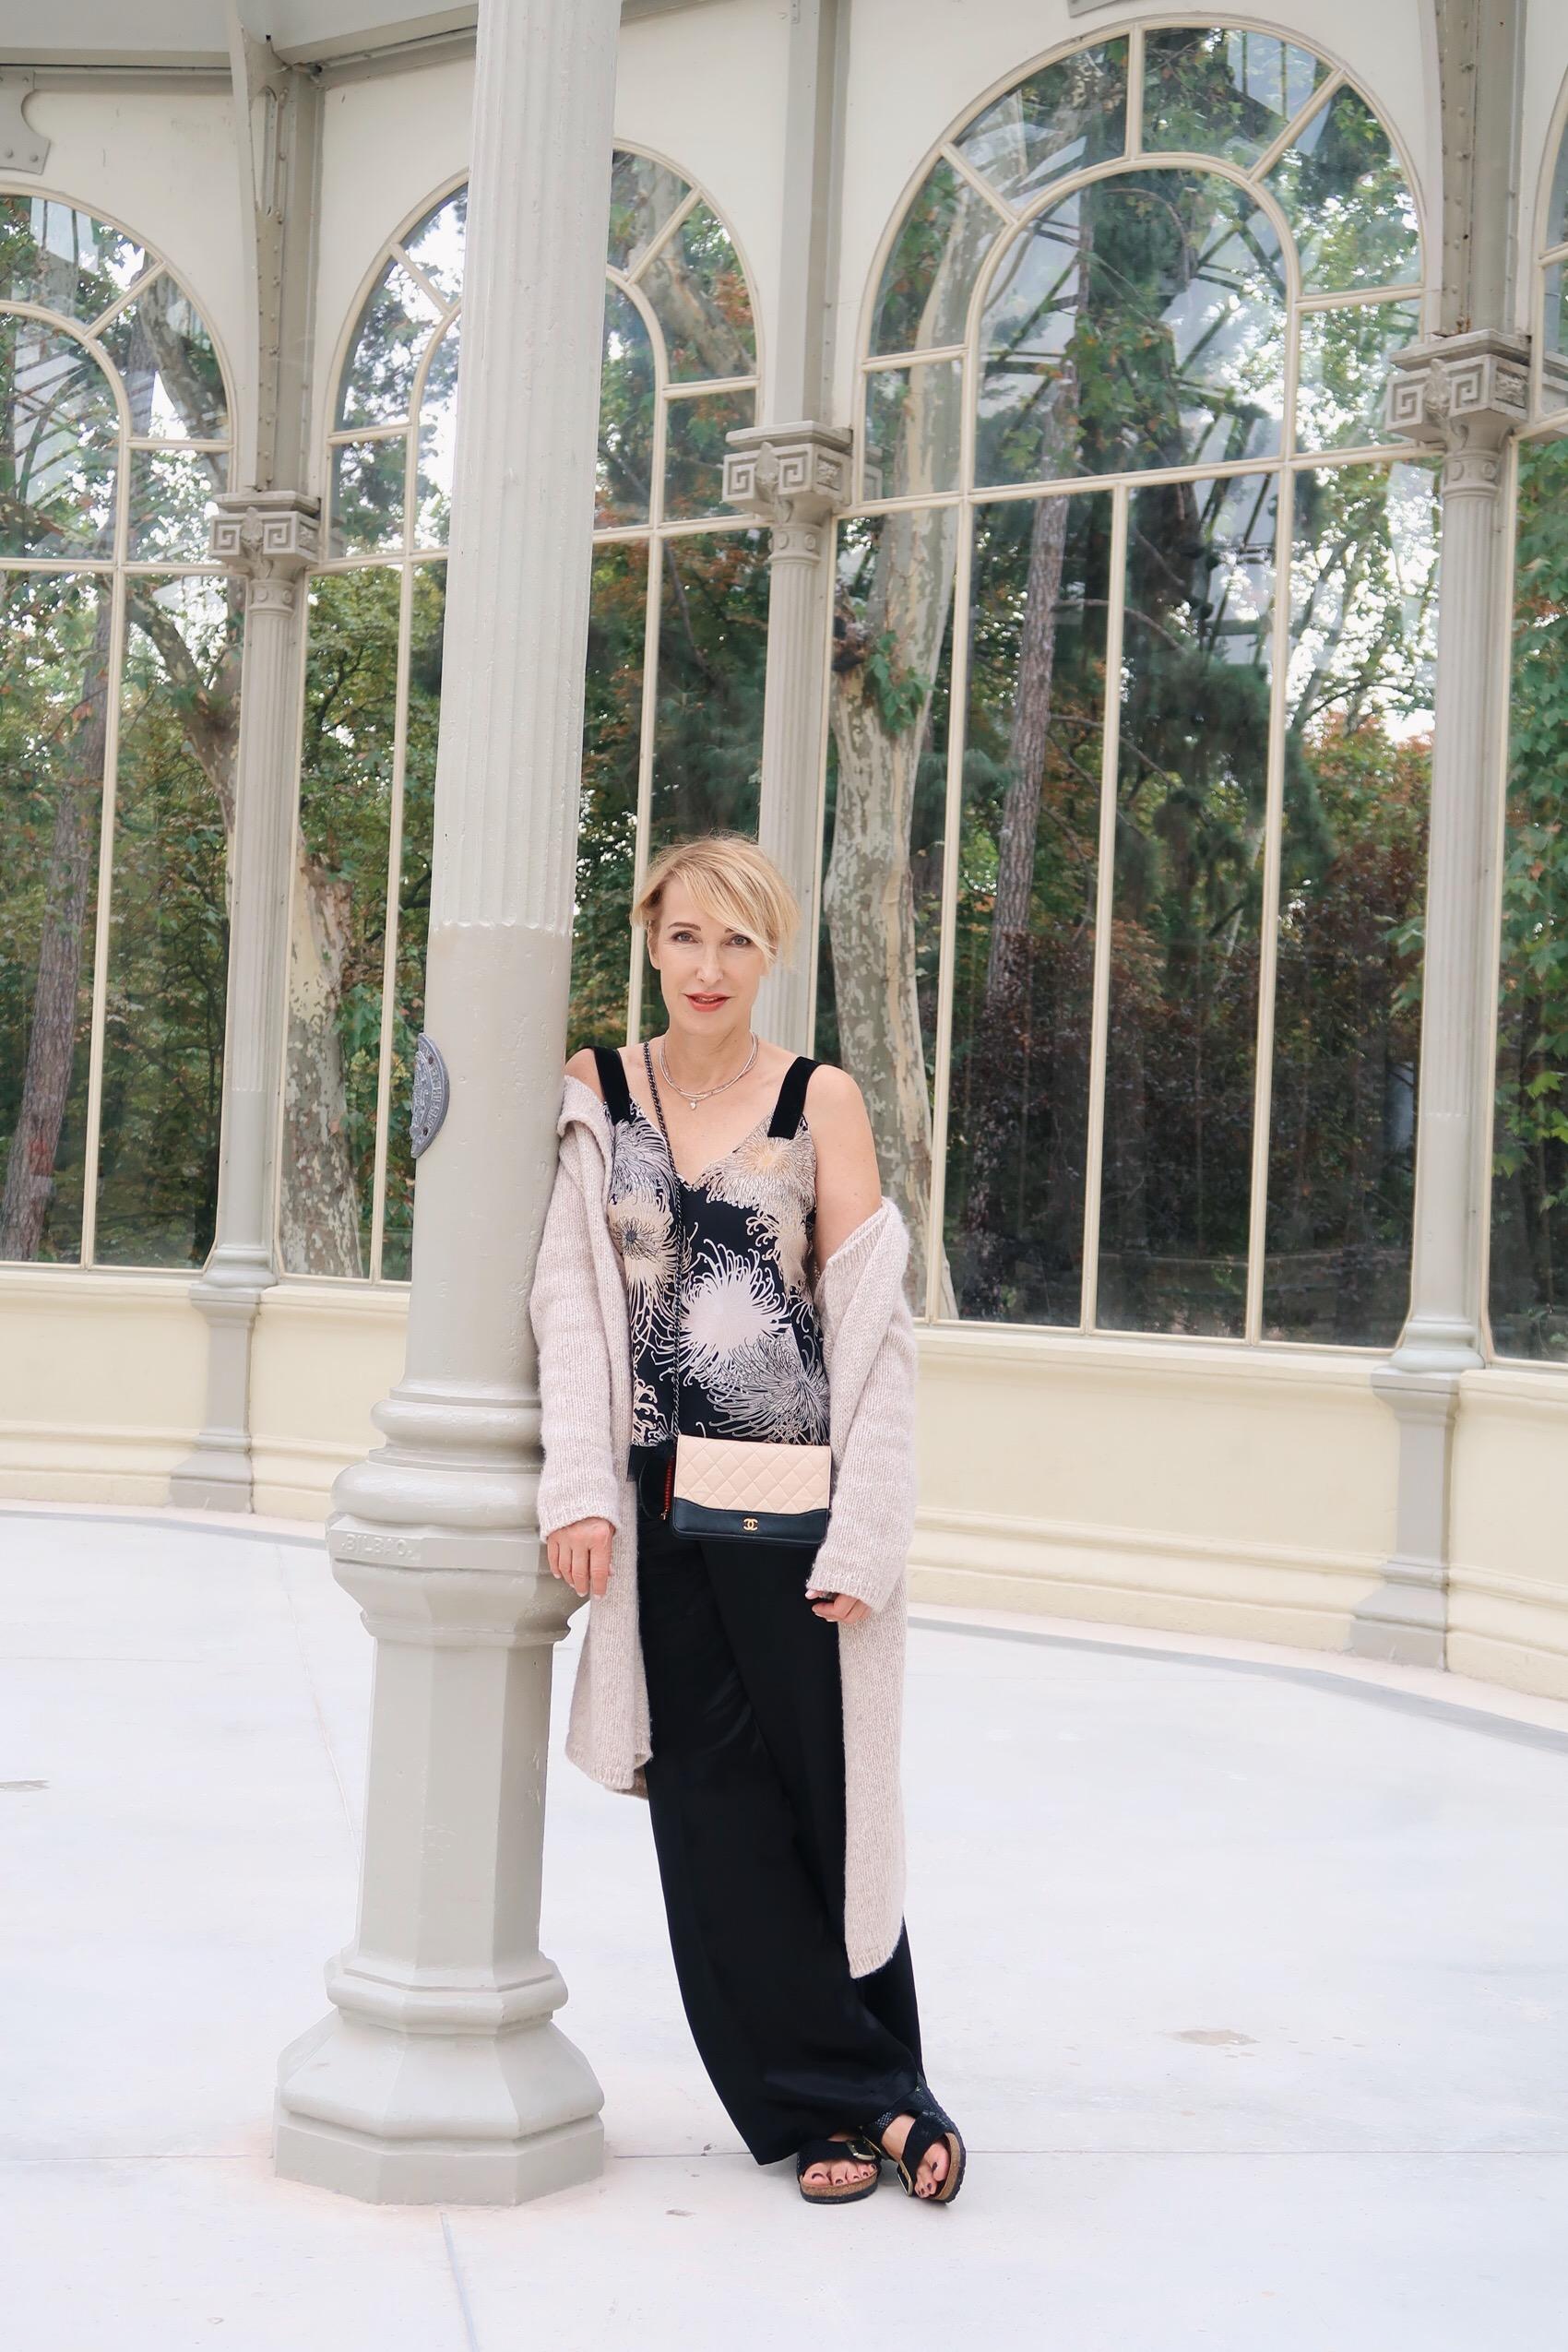 glamupyourlifestyle madrid ü-40-blog ue-40-blog ü-50-blog ue-50-blog fashionblog